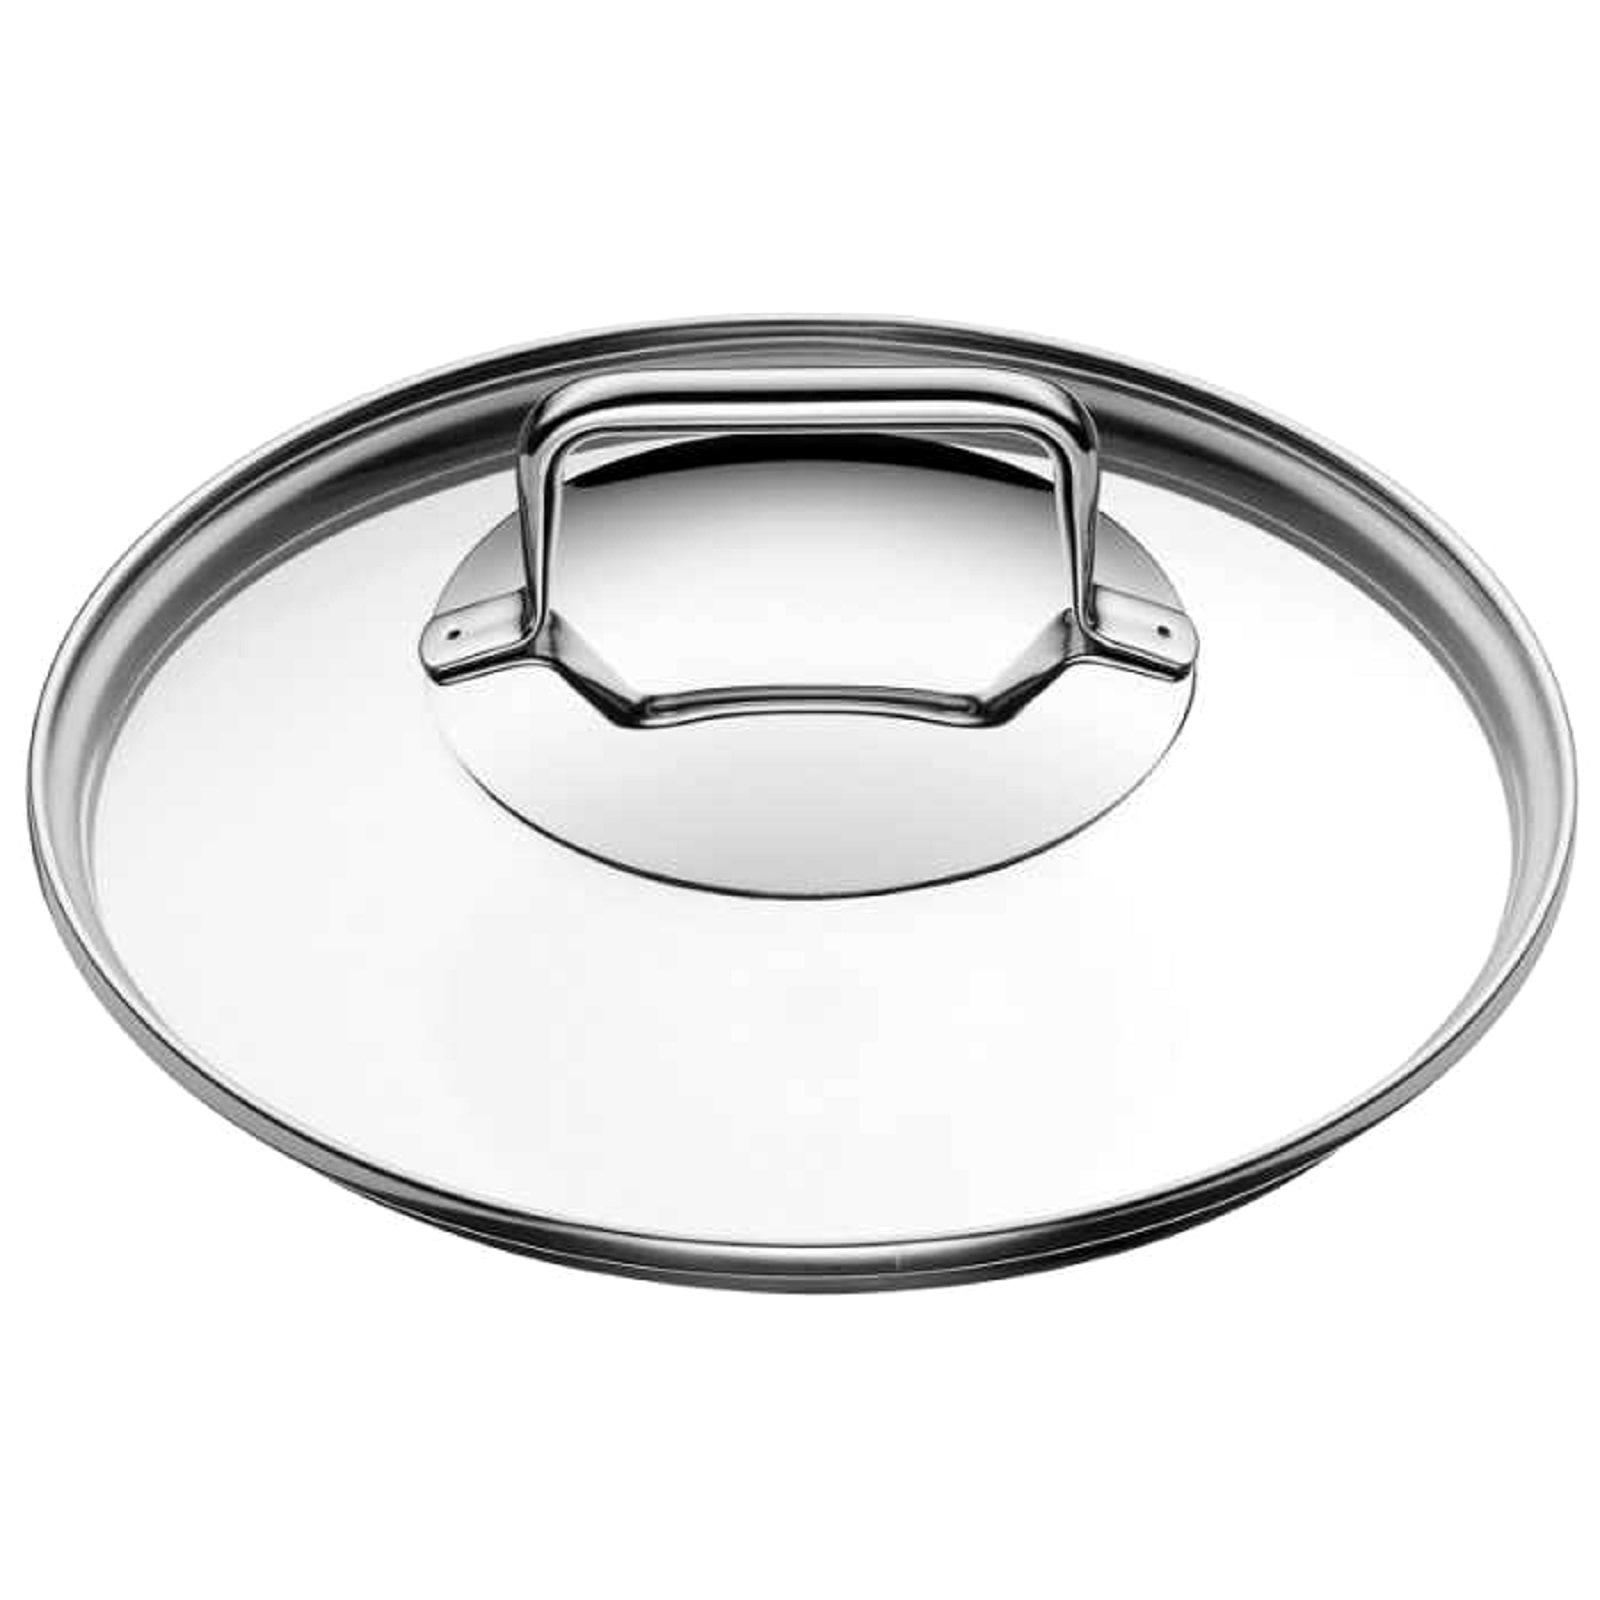 Онлайн каталог PROMENU: Крышка для кастрюли WMF TREND, диаметр 20 см, прозрачный WMF 07 7220 6382